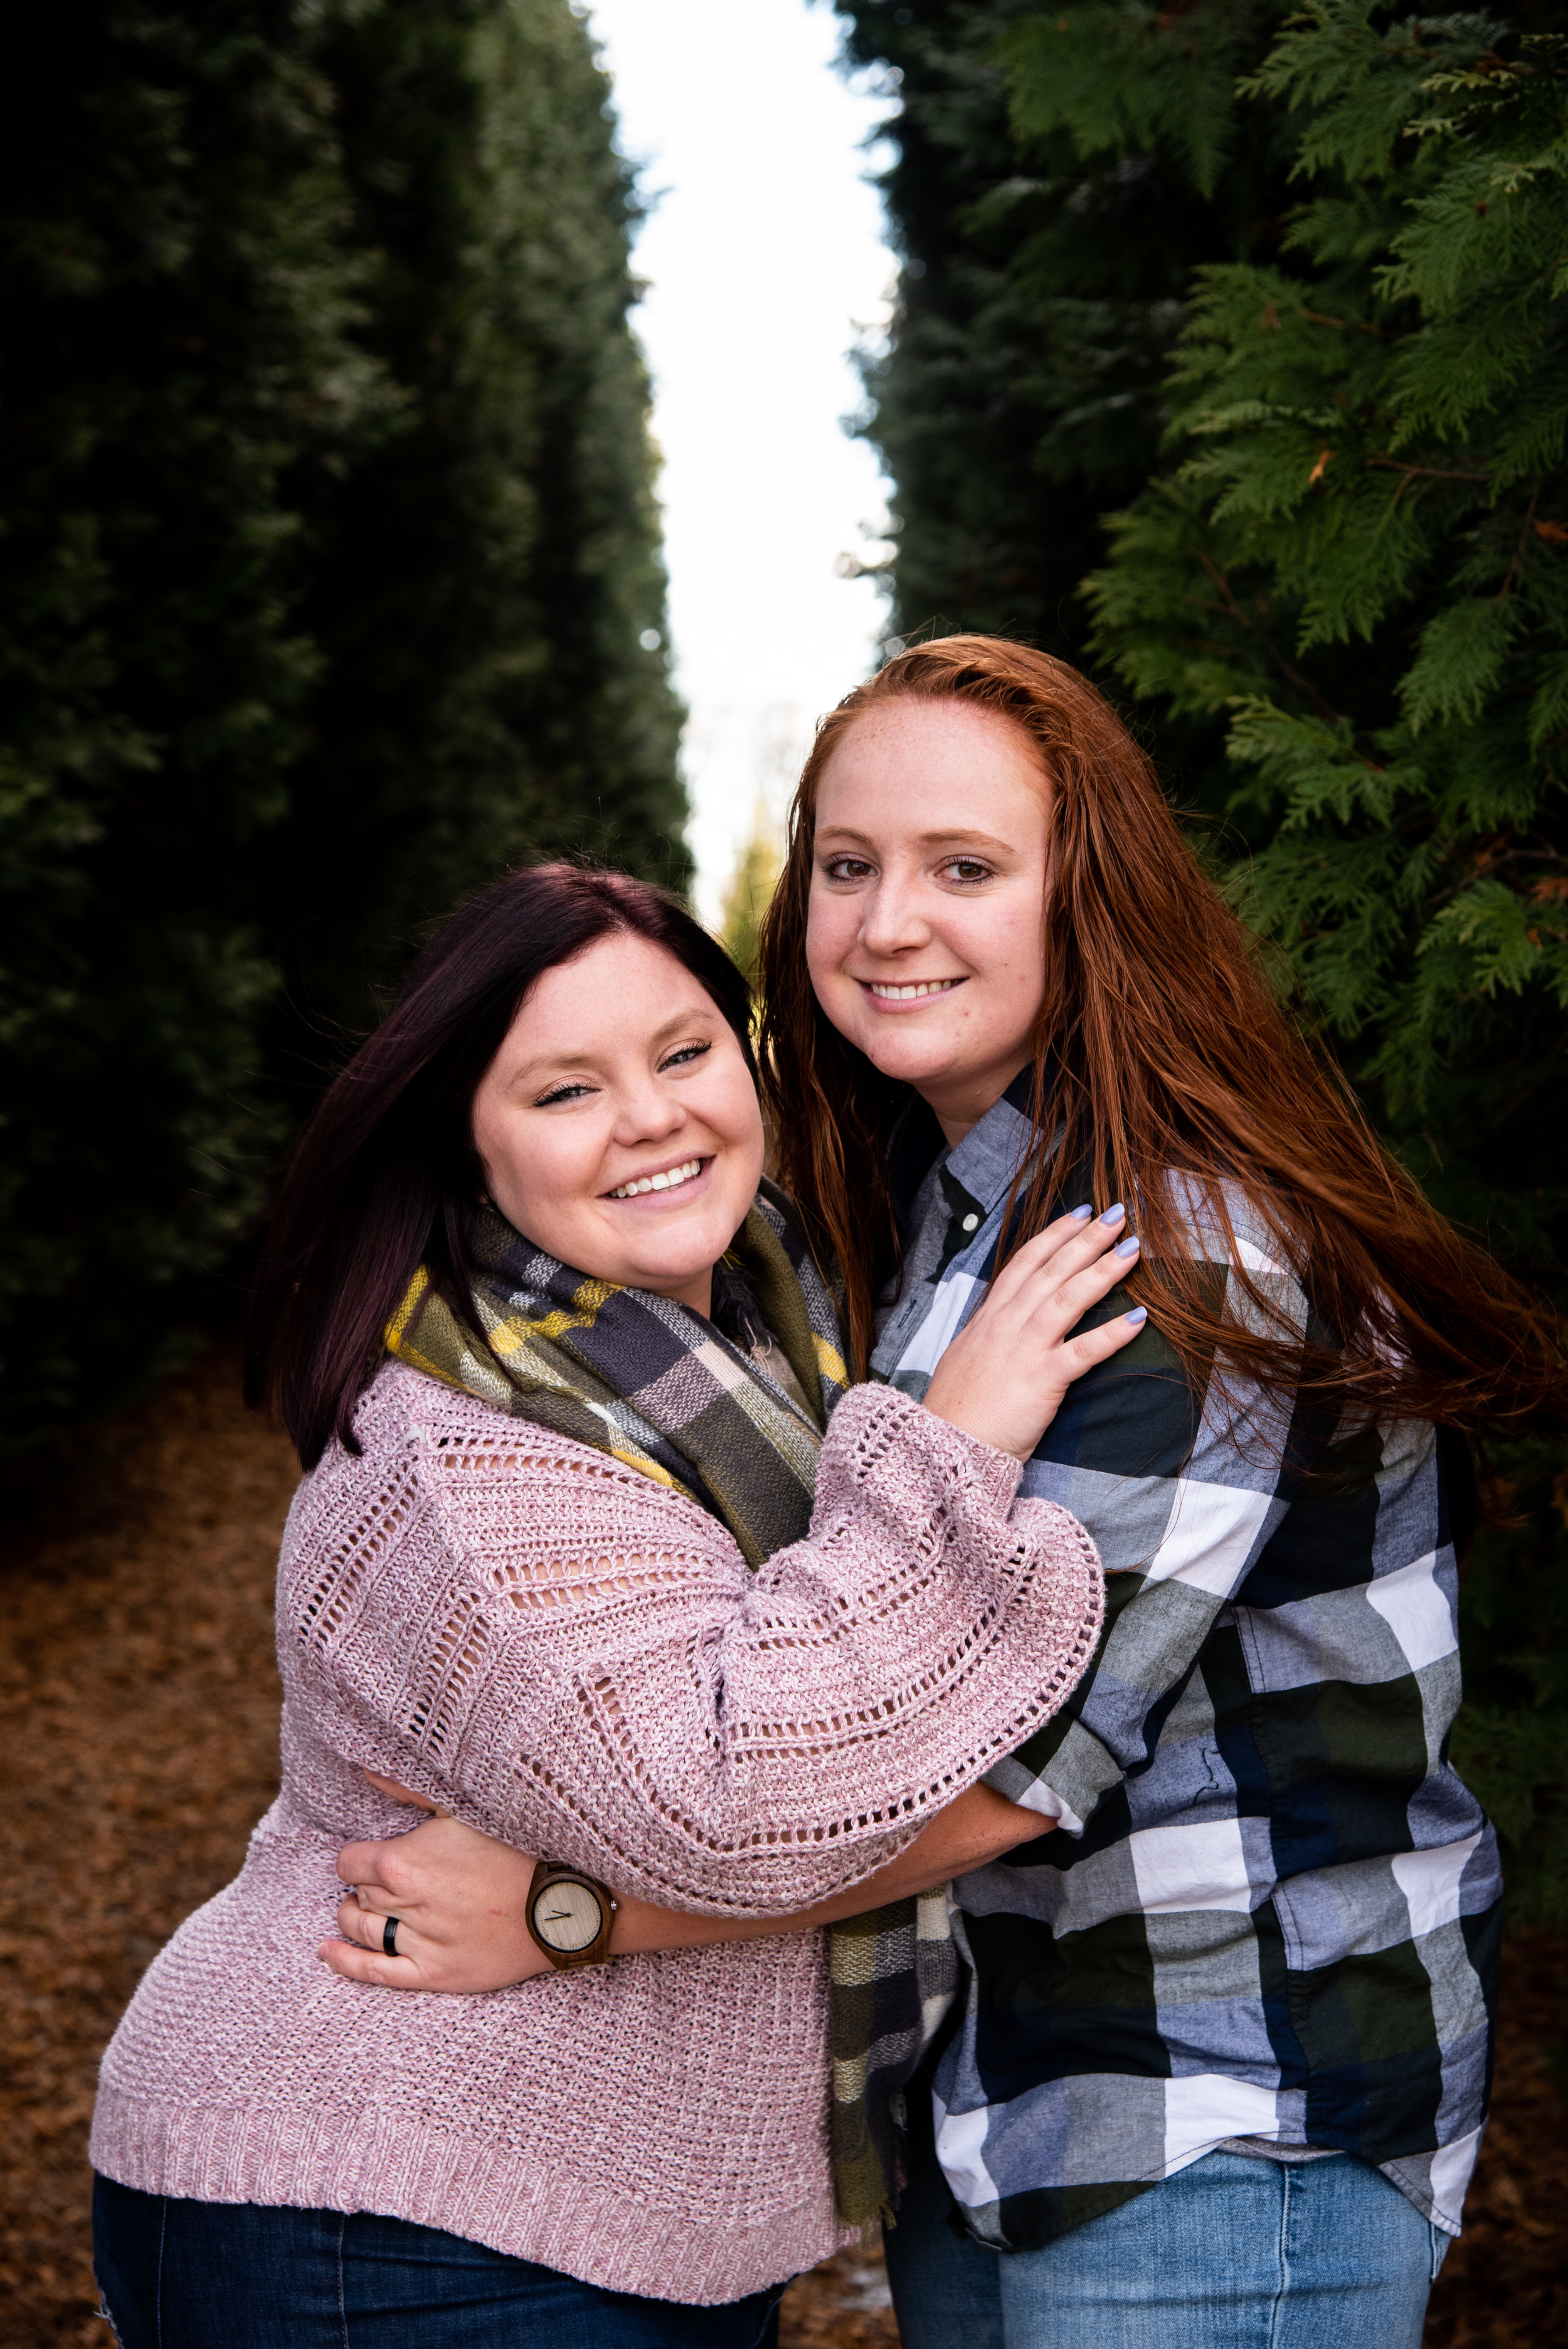 Kyla Jo Photography // Muncie Indiana Photographer // Family Photos // Whitetail Tree Farm // Wife and Wife Photo Shoot // Winter Photo Shoot // Christmas Tree Farm Photo Session